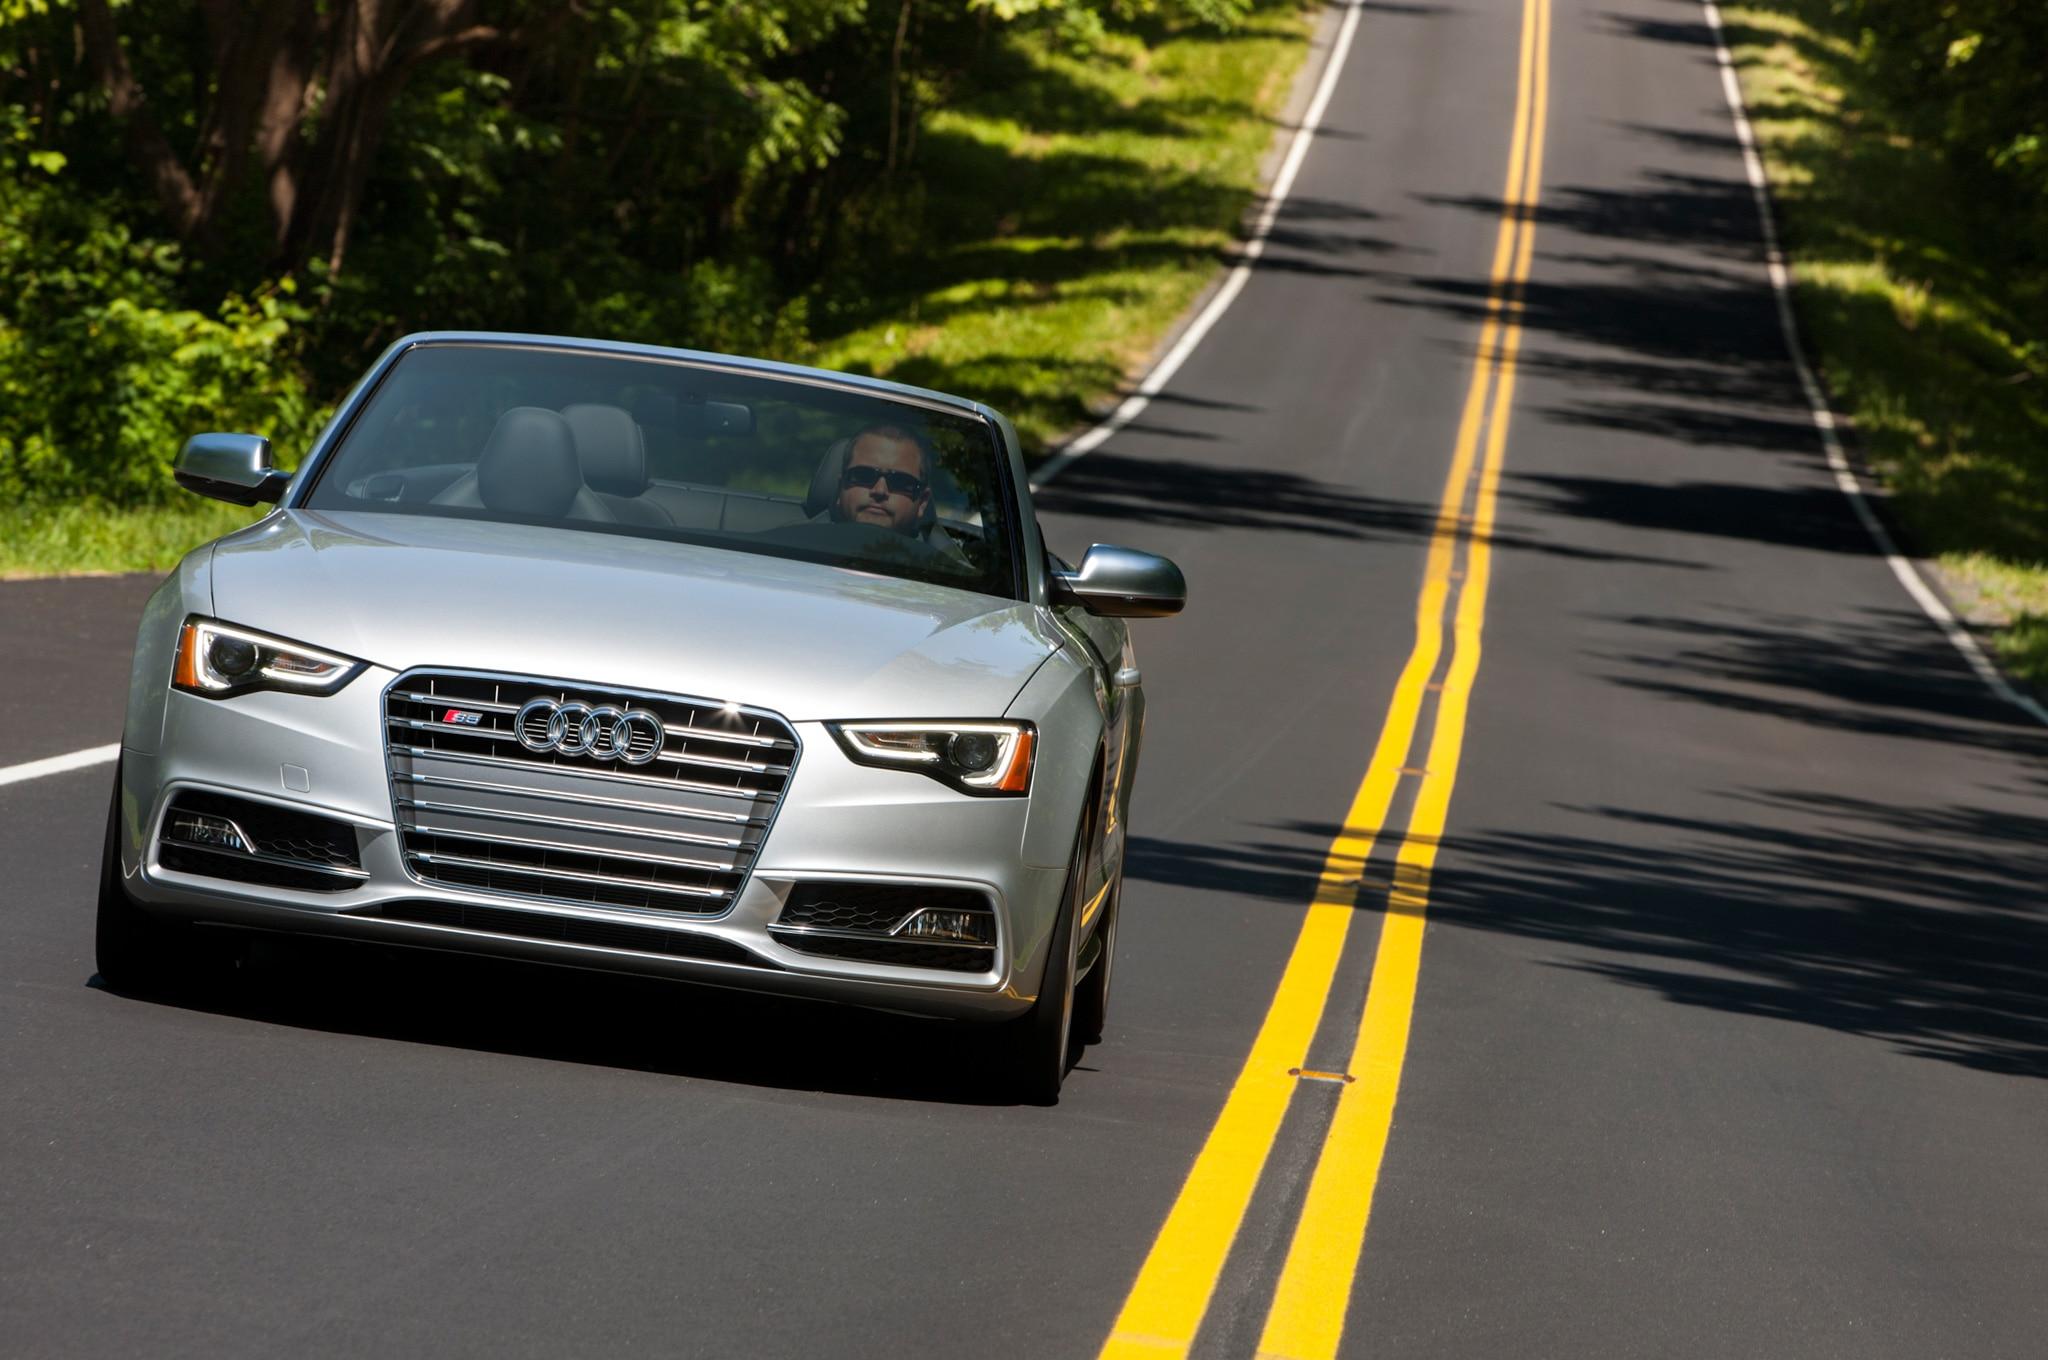 Audi S5 Cabriolet Lead Image1